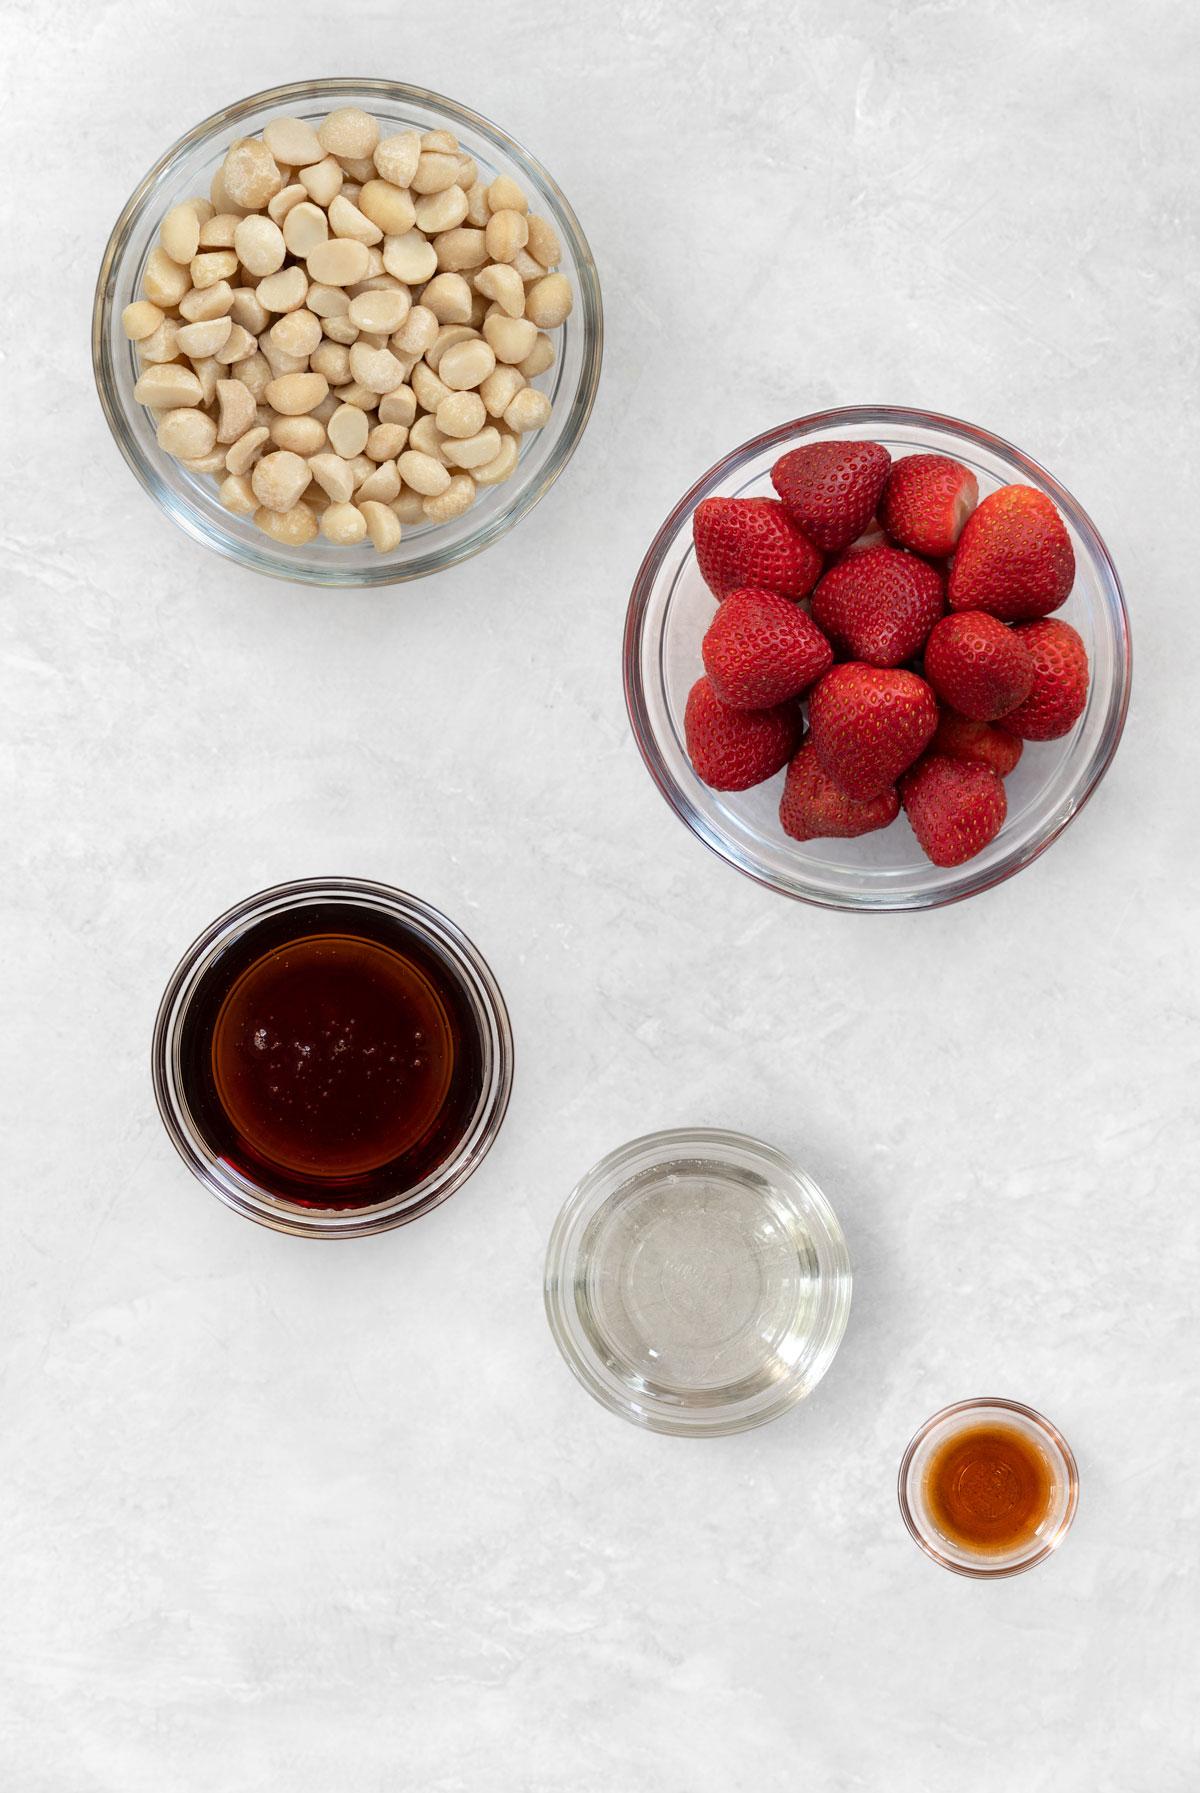 no-bake strawberry cheesecake filling ingredients